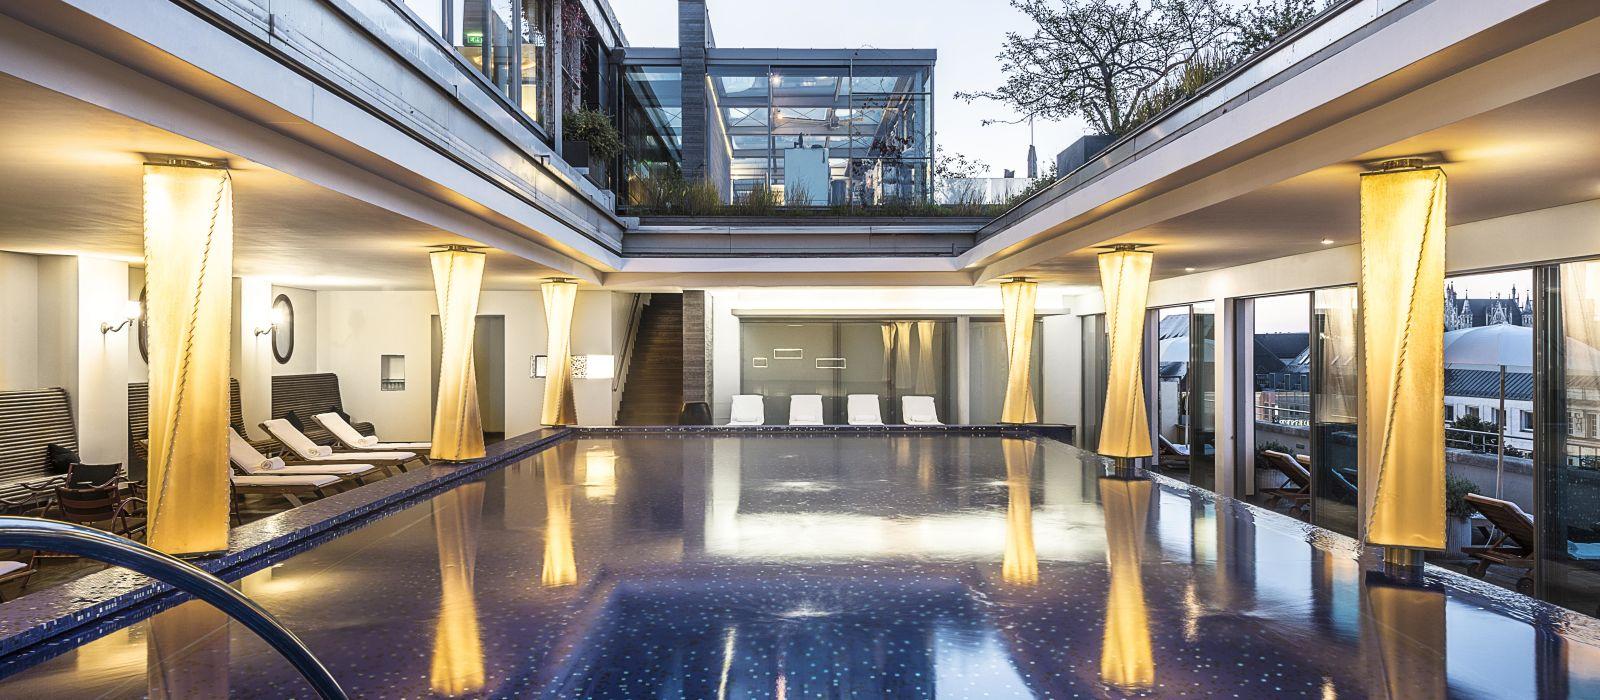 Hotel Bayerischer HOF Germany